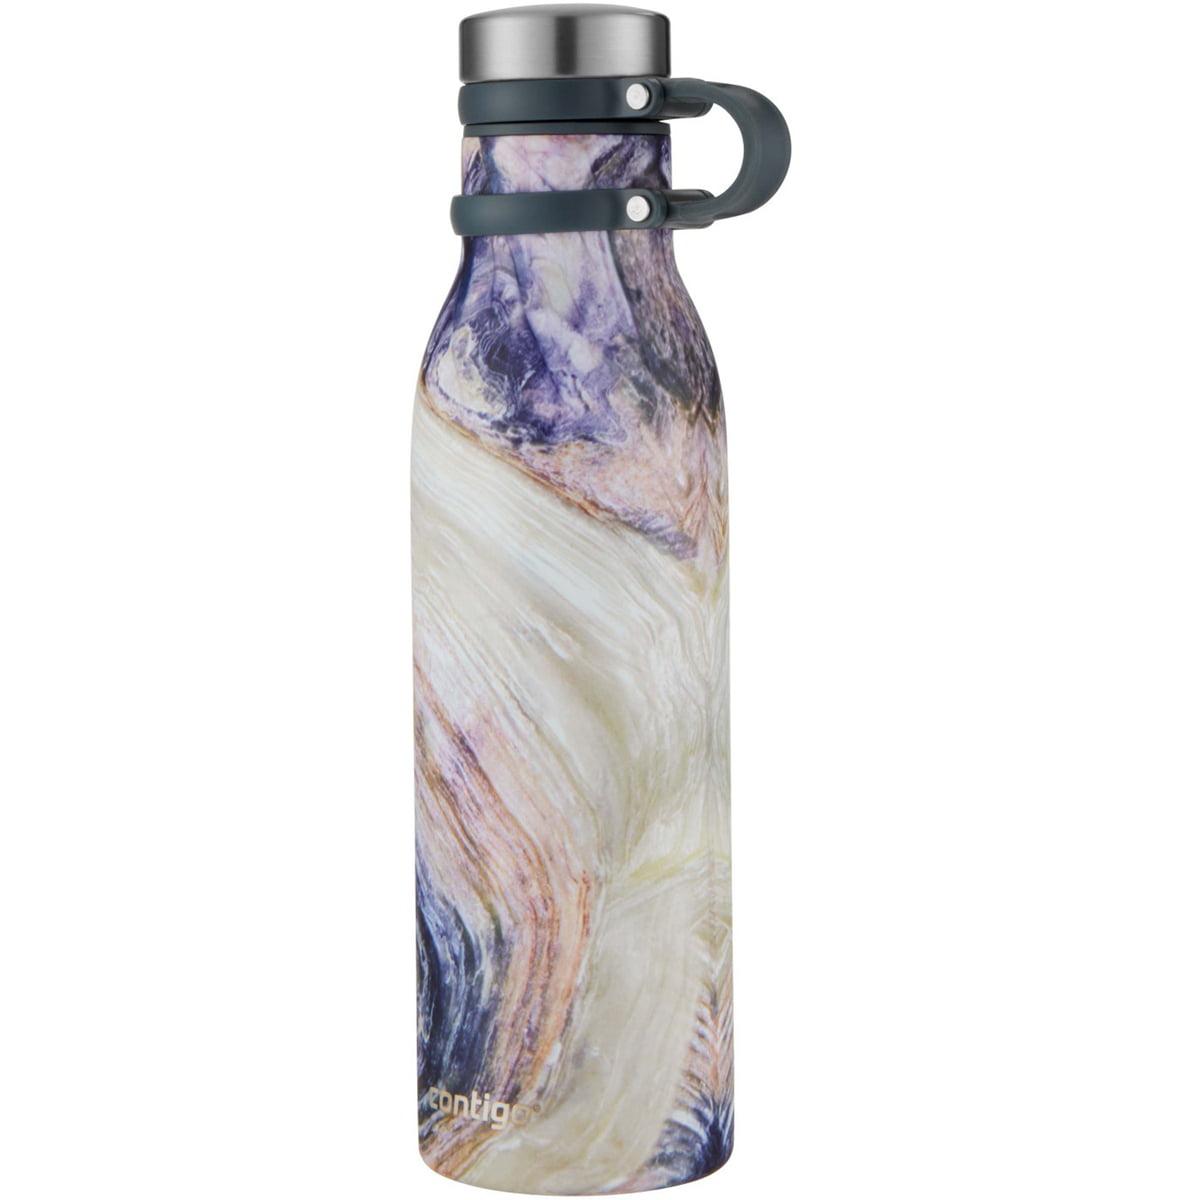 Contigo 20 oz. Matterhorn Couture Thermalock Stainless Steel Water Bottle